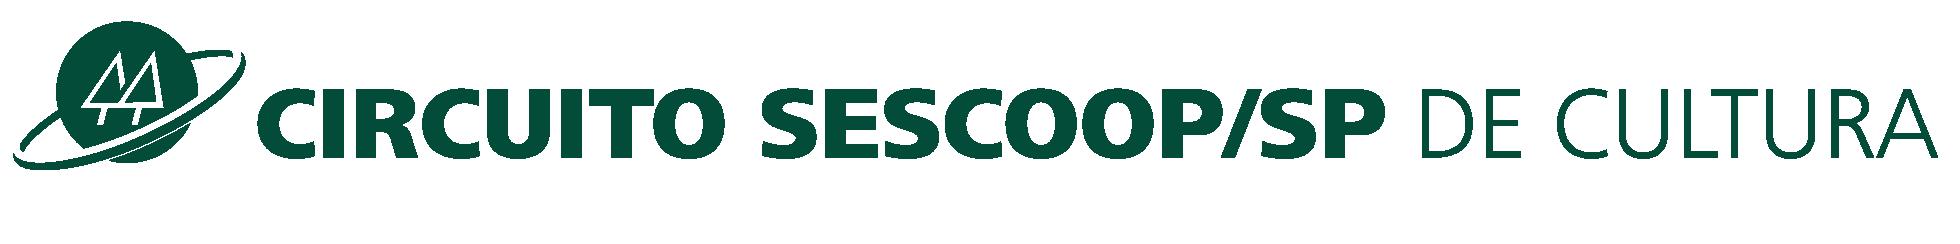 Circuito Sescoop/SP de Cultura